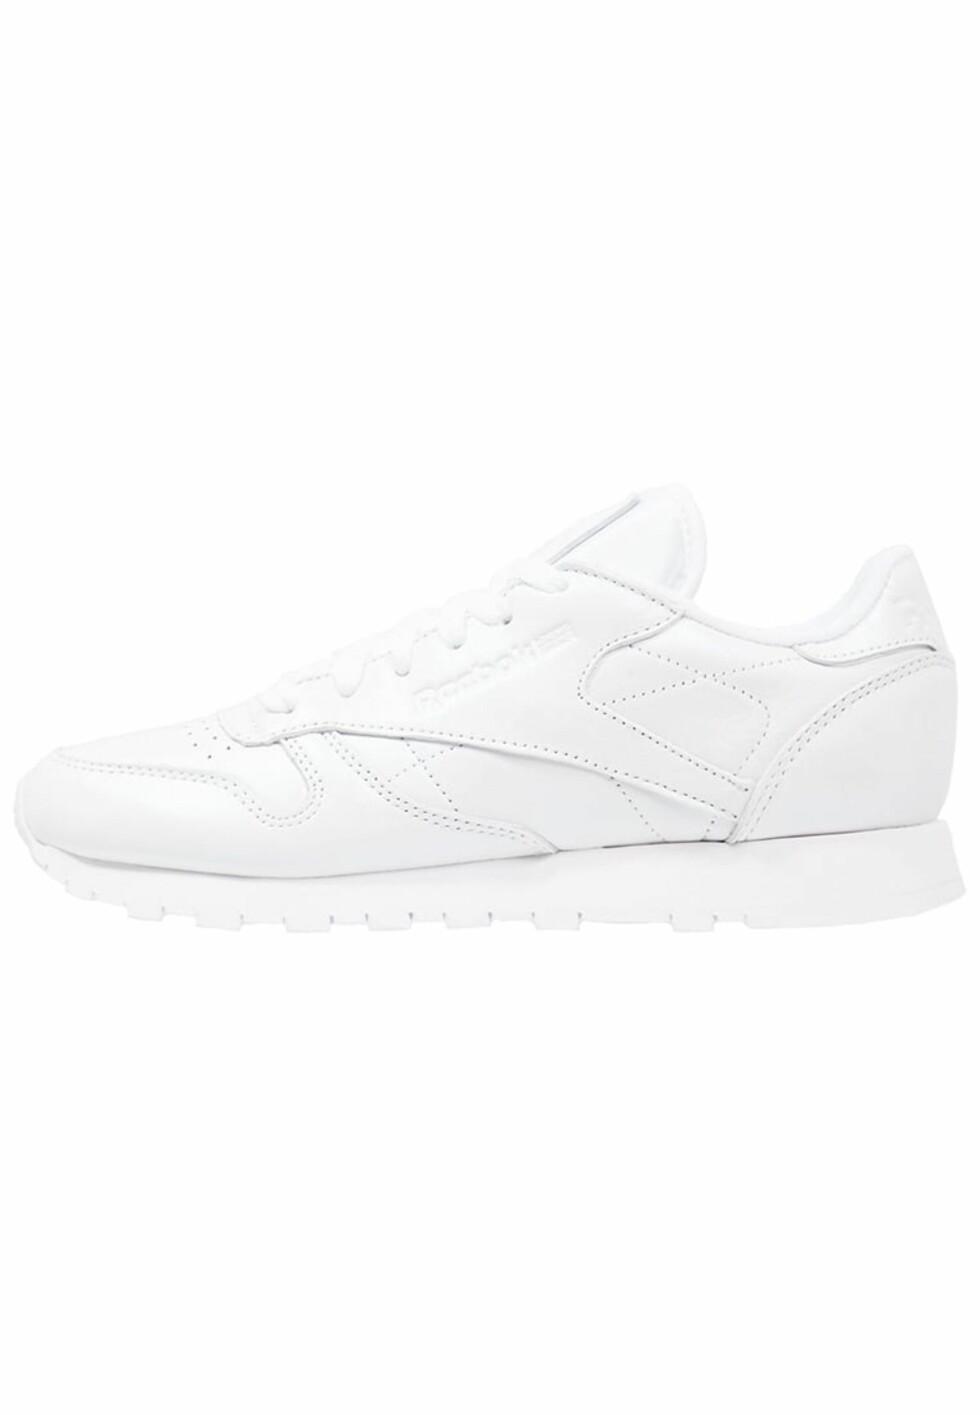 Sneakers fra Reebok via Zalando.no | kr 849 | http://marketing.net.zalando.no/ts/i4062628/tsc?amc=performance.znd.47259.54735.57747&rmd=3&trg=https%3A%2F%2Fwww.zalando.no%2Freebok-classic-classic-leather-pearlized-joggesko-re011s04w-a11.html%3Fwmc%3DAFF47_IG_NO.%23%7BPARTNER_ID%7D_%23%7BADSPACE_ID%7D..